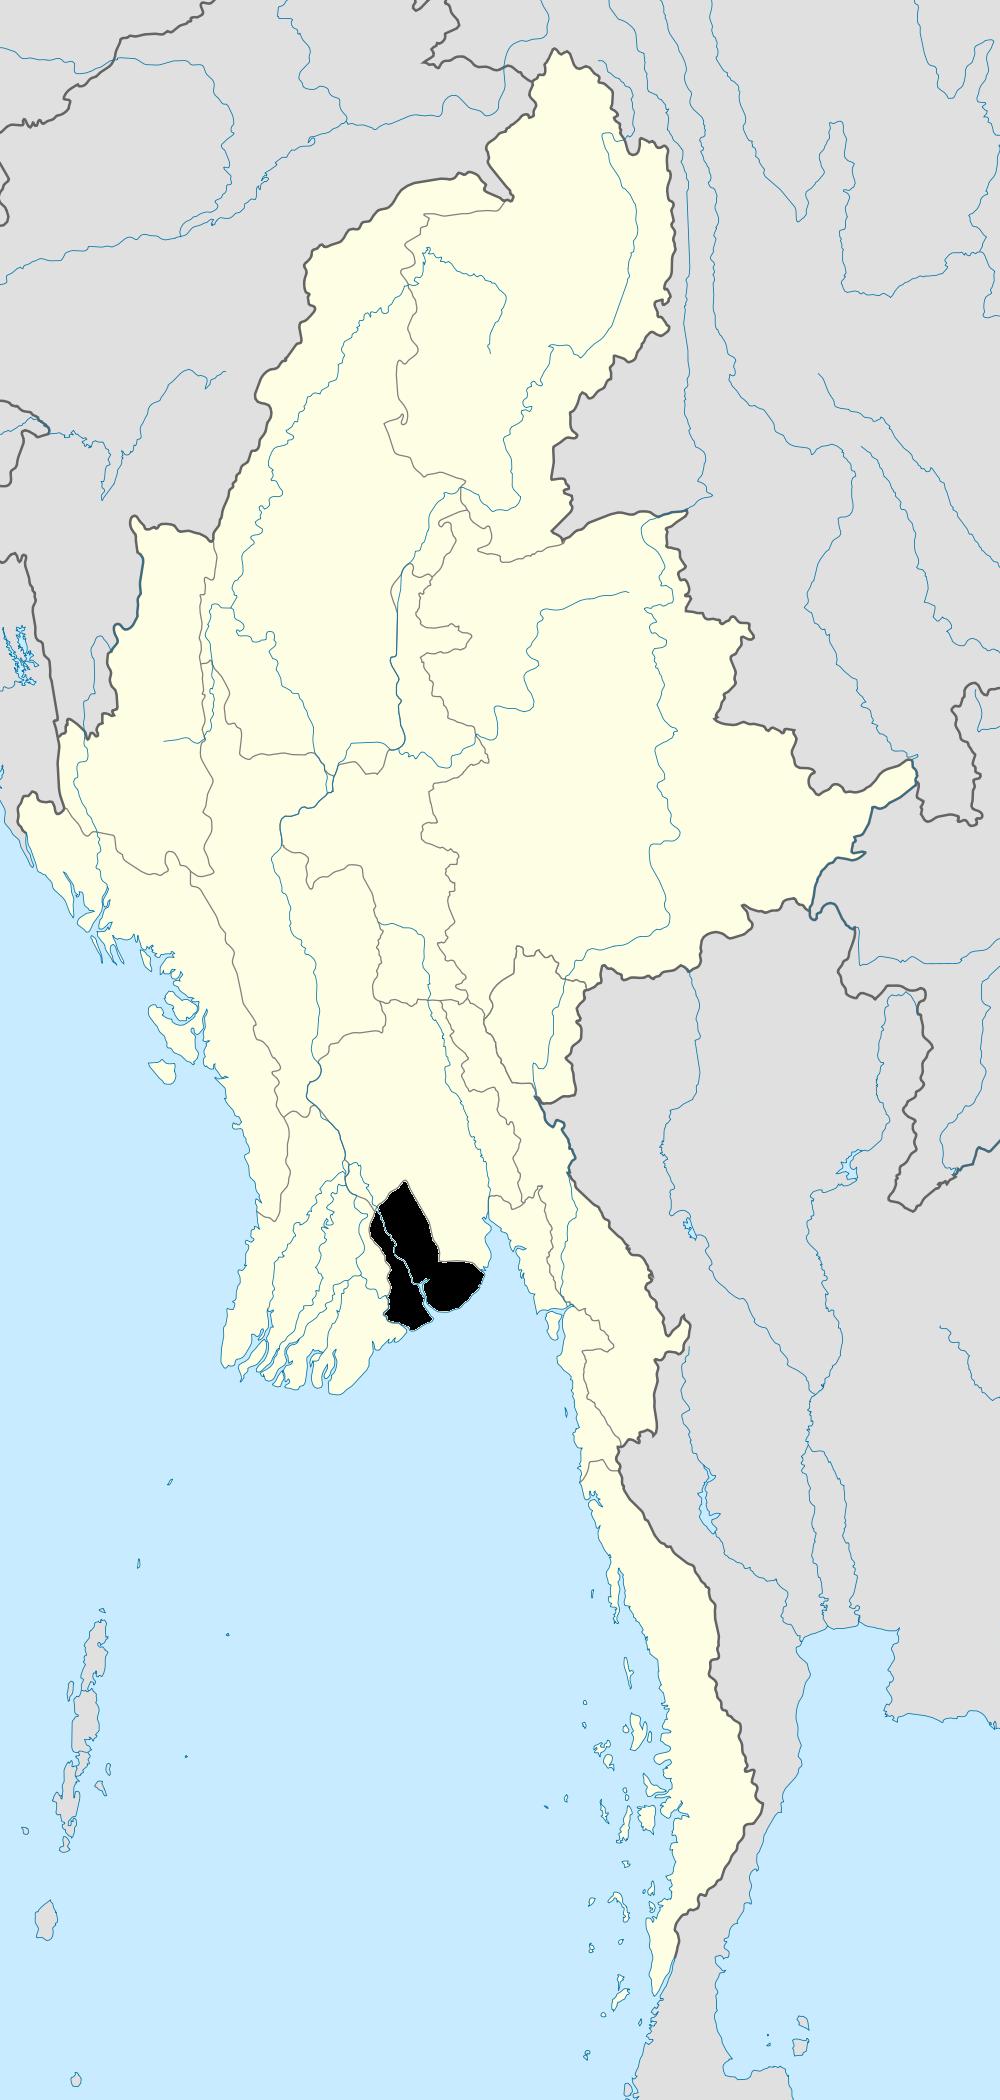 File:Burma Yangon locator map.png - Wikipedia on vientiane map, burma map, taiohae map, hanoi map, hong kong map, bumthang map, phnom penh, ho chi minh city, manila map, rangoon map, mekong river map, siem reap, jakarta map, islamabad map, bandar seri begawan map, great wall of china map, bangkok map, kuala lumpur, murang'a map, aung san suu kyi, burmese language, kuala lumpur map, taipei map, yangtze river map, naypyidaw map, myanmar map,